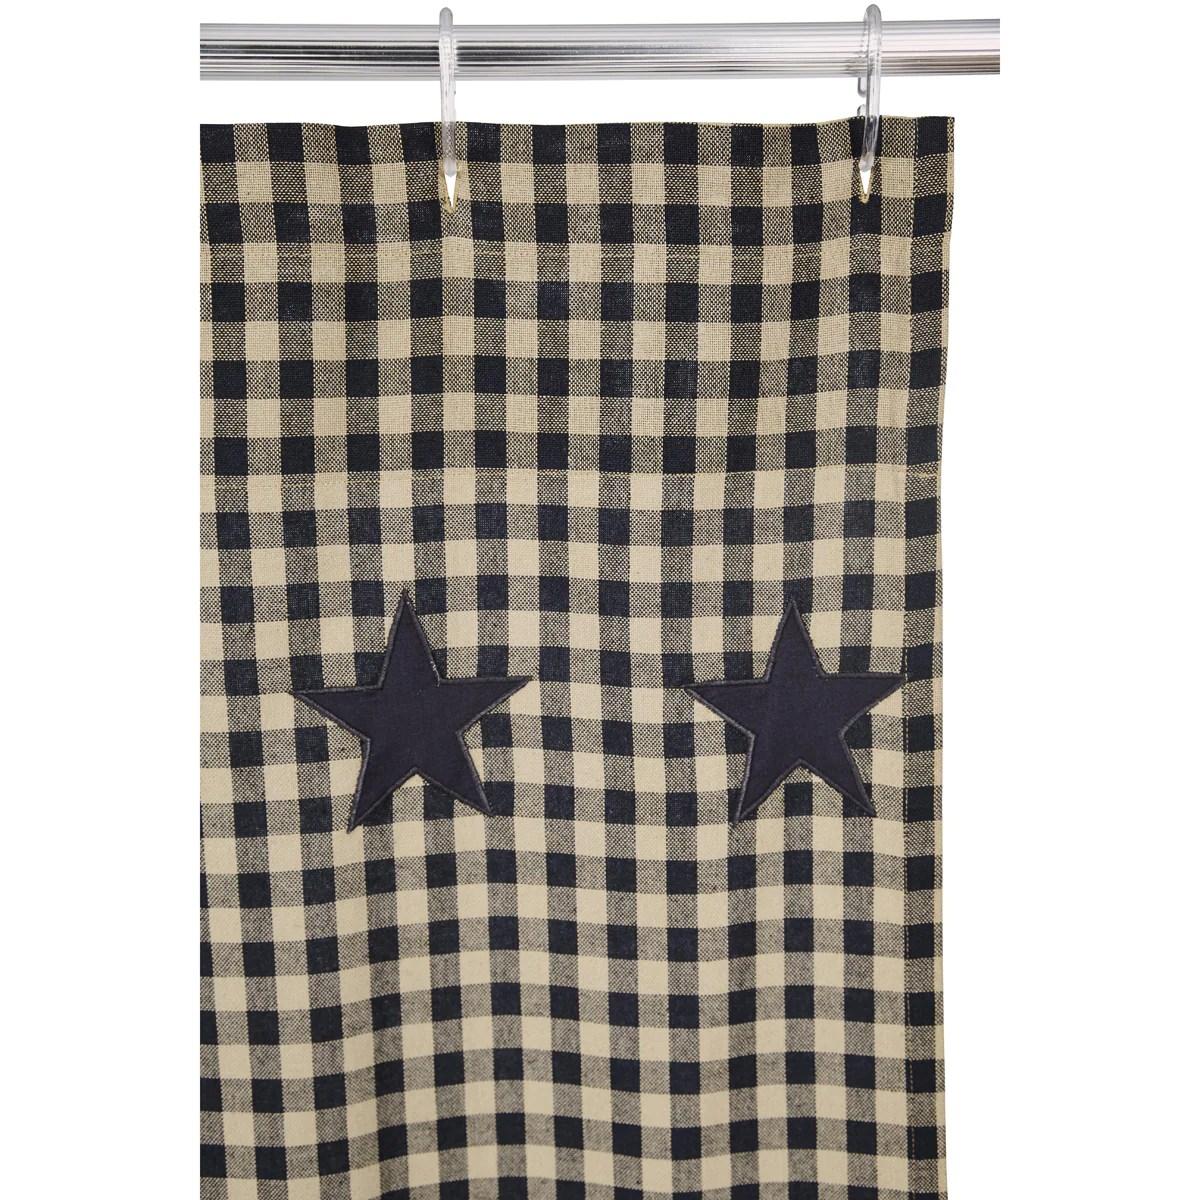 black star scalloped shower curtain